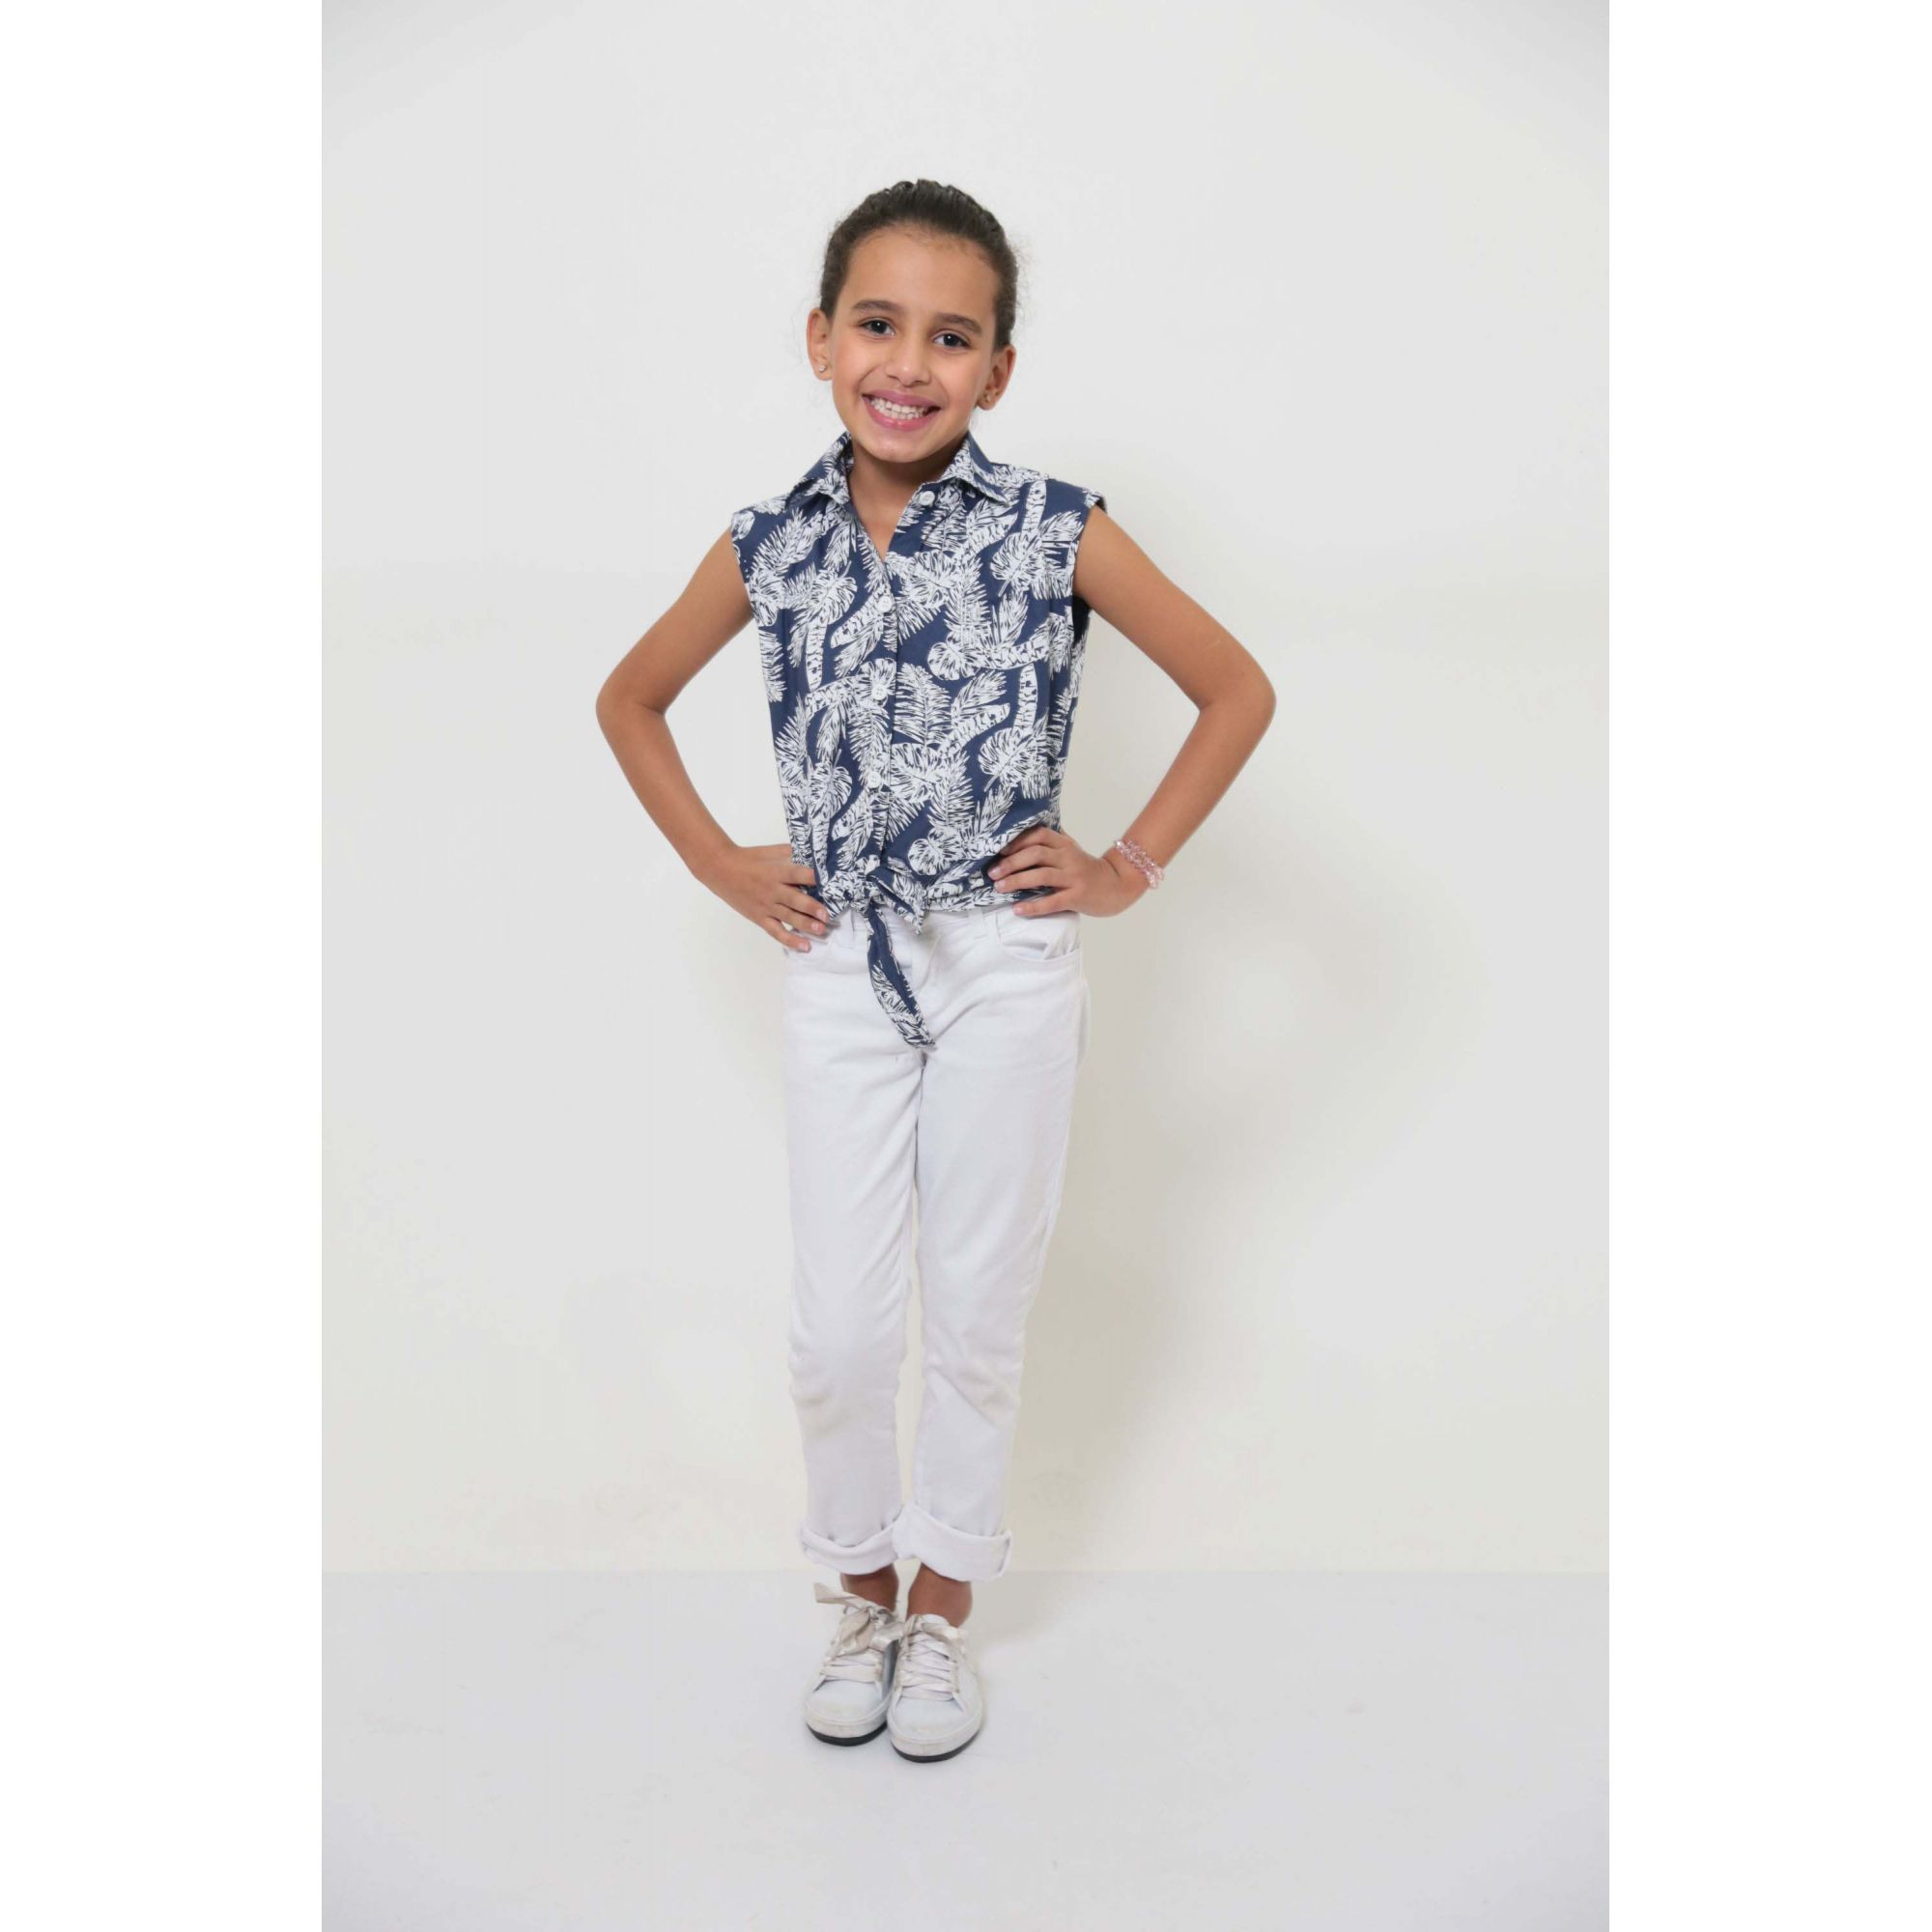 PAI E FILHA > Bermuda Masculina + Camisa Feminina Infantil Azul Floresta [Coleção Tal Pai Tal Filha]  - Heitor Fashion Brazil